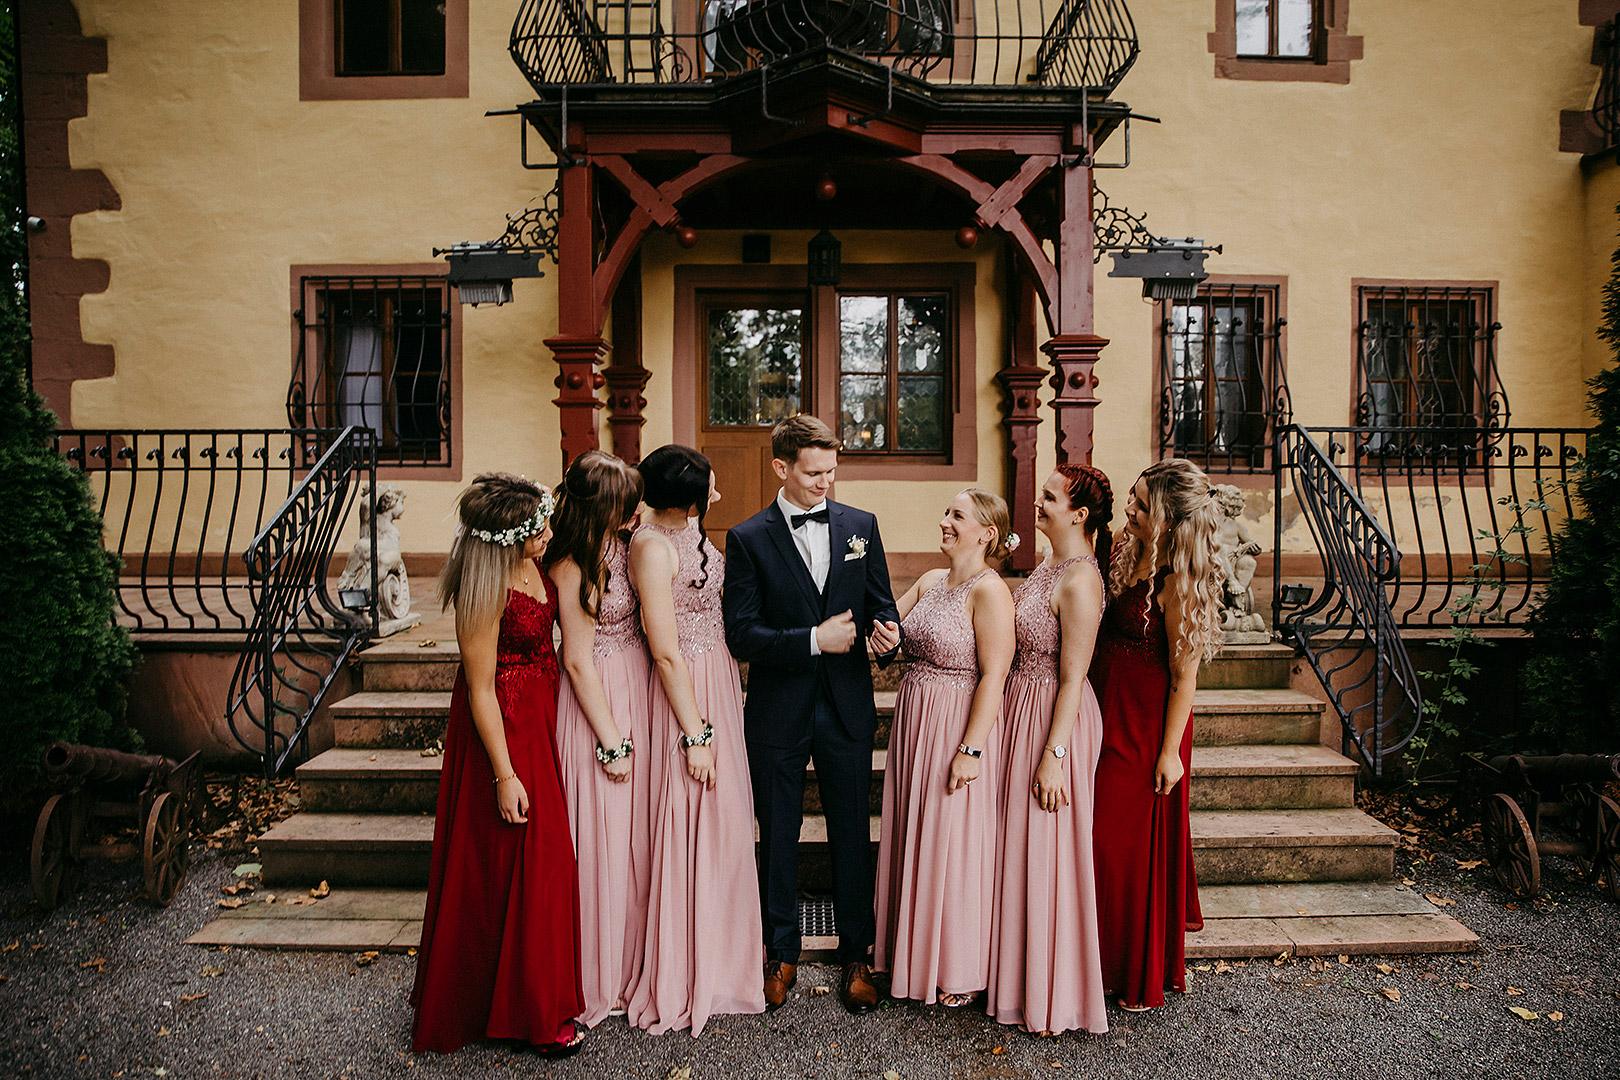 portrait_wedding_saskiaunddavid_45